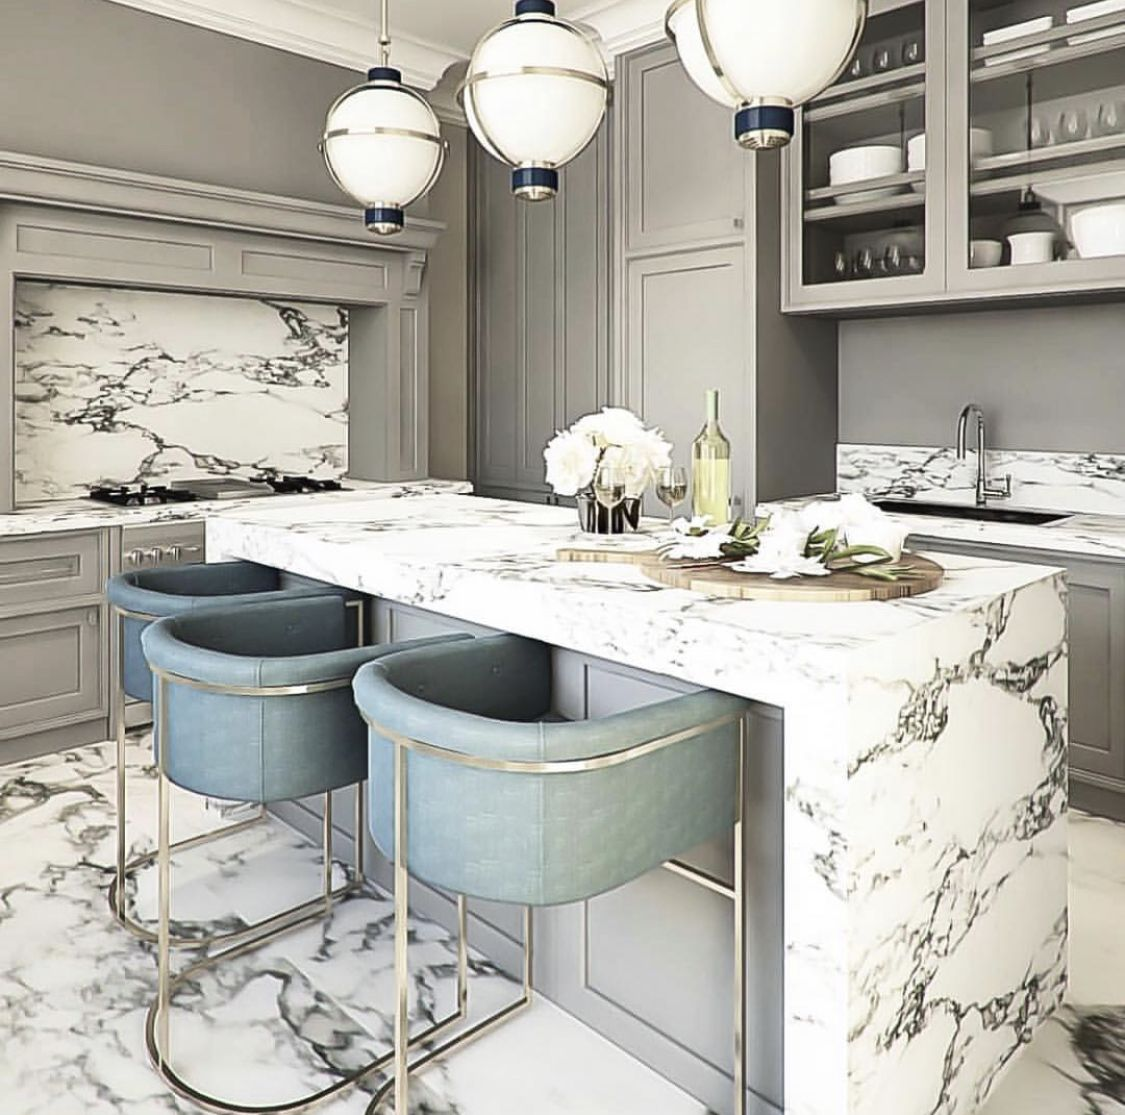 Pin by Dara on Home goals   Minimalist kitchen design, House ...